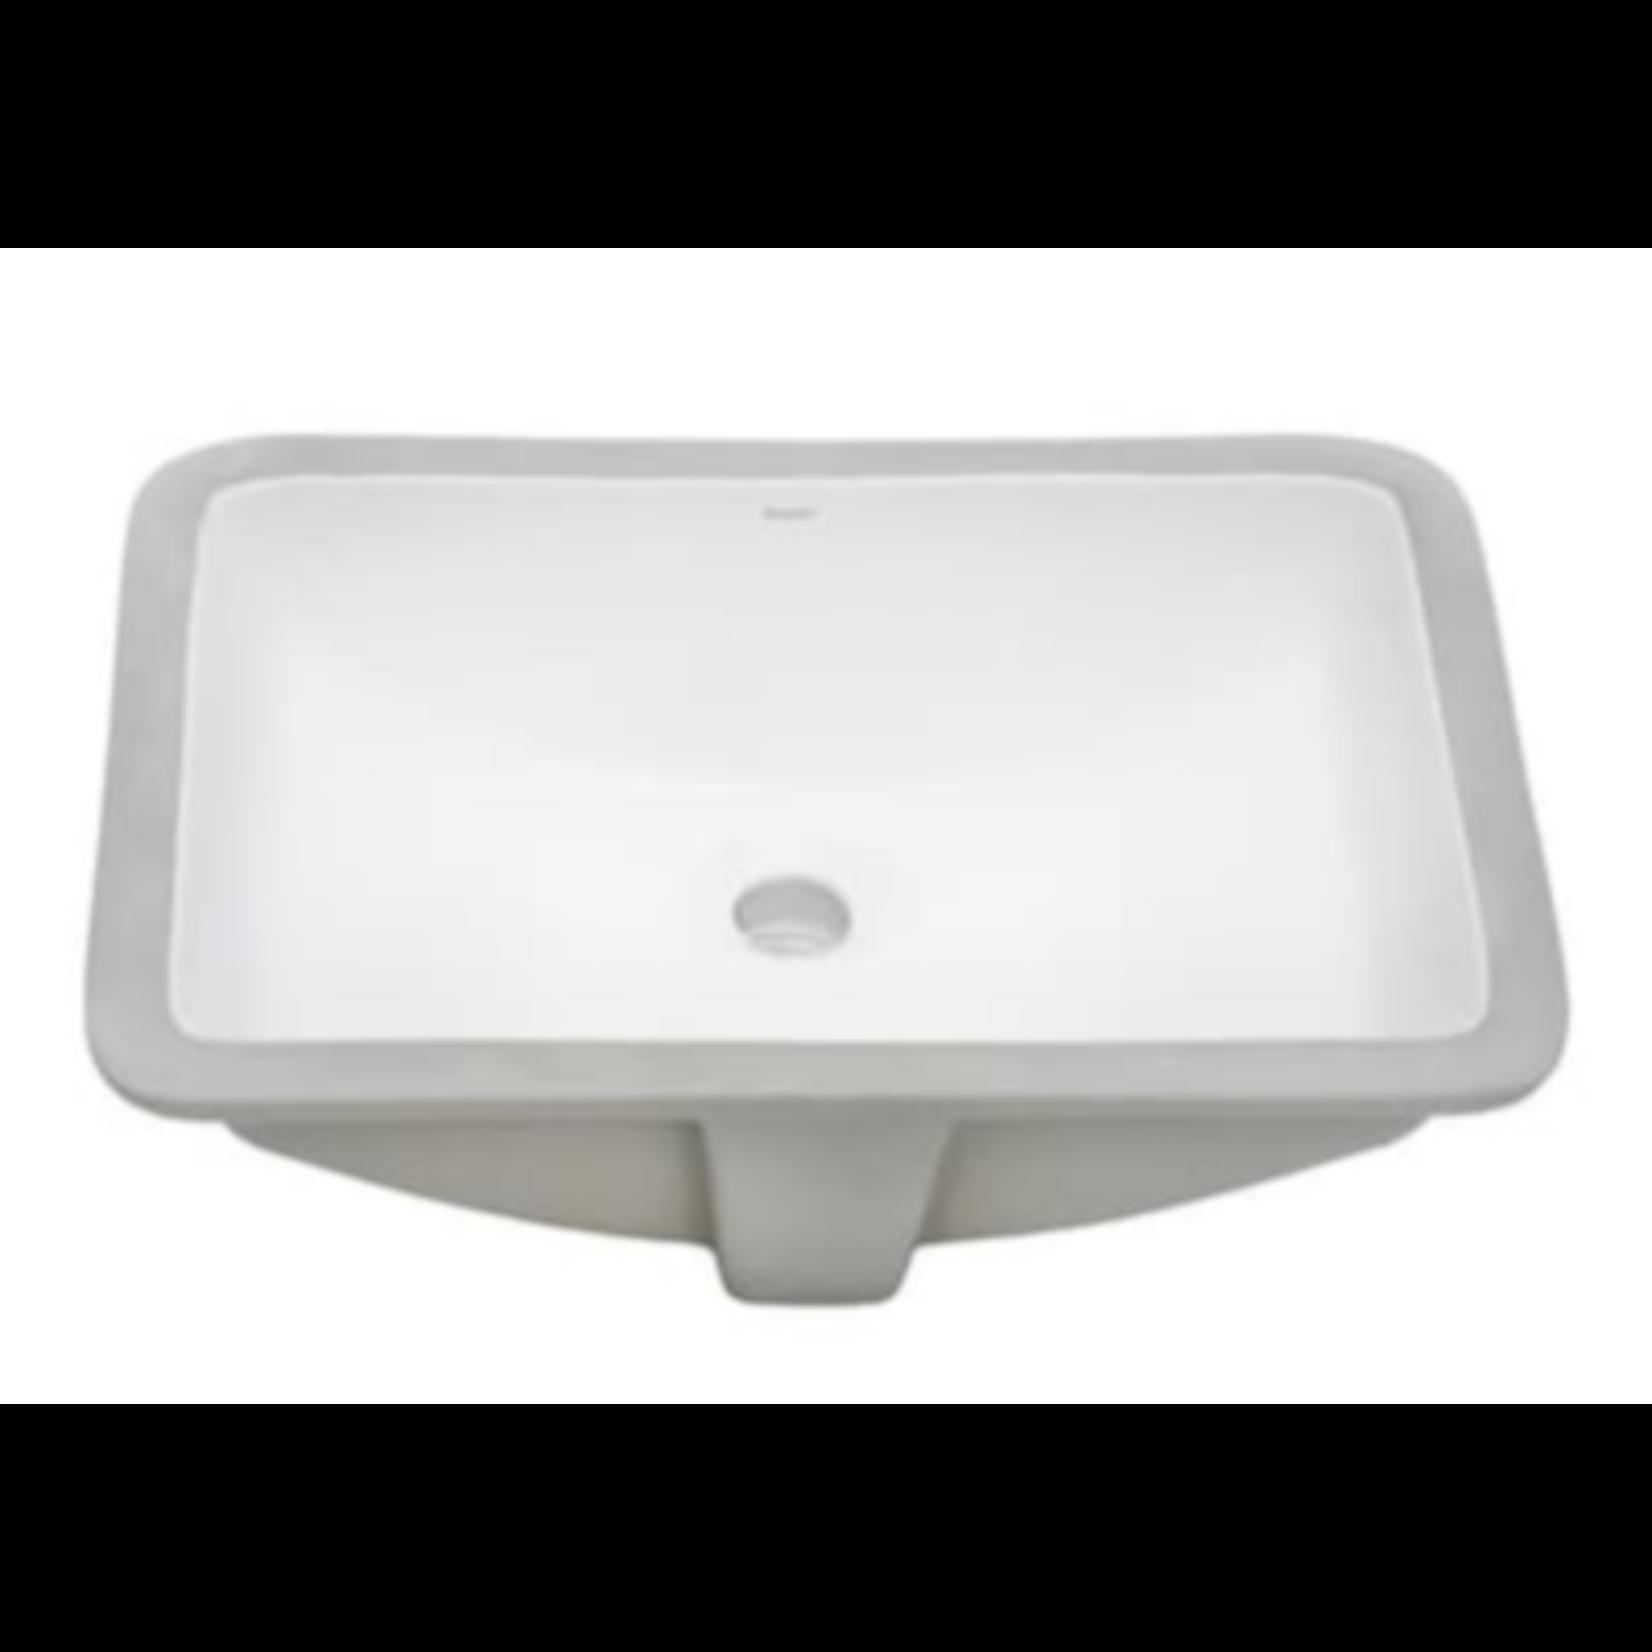 2854 Ruvati Krona White Ceramic Undermount Bathroom Sink